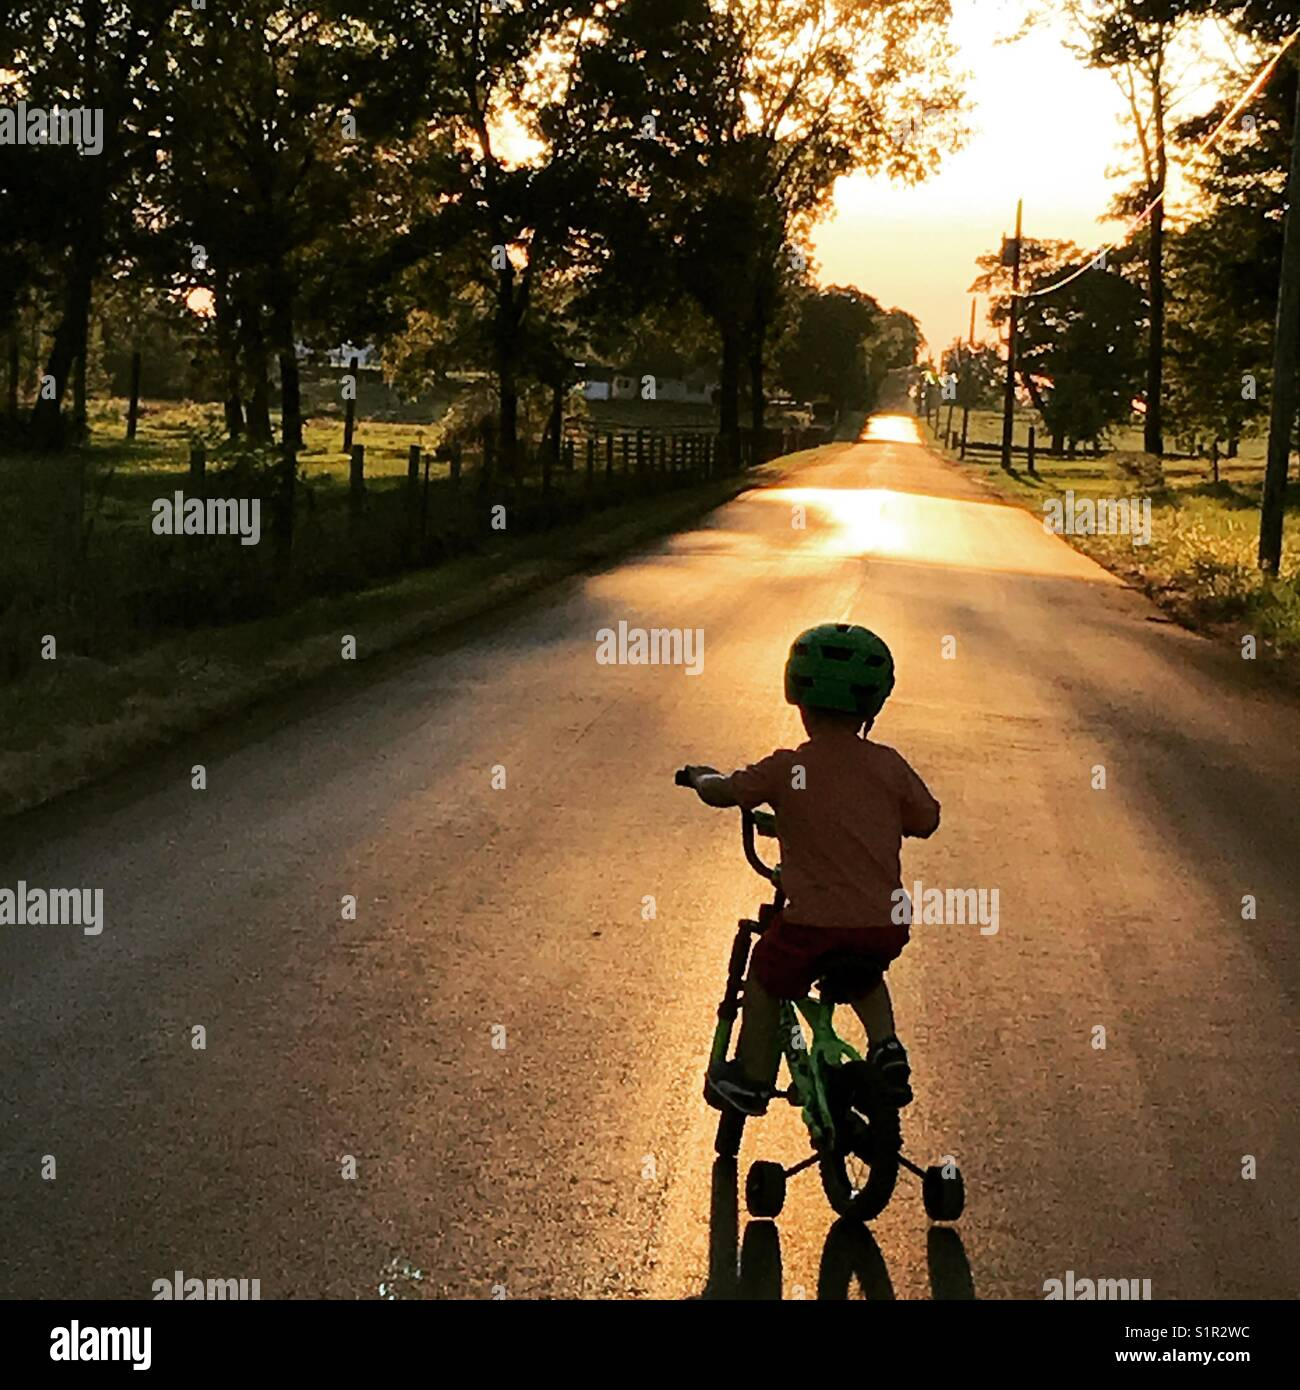 Evening bike ride - Stock Image